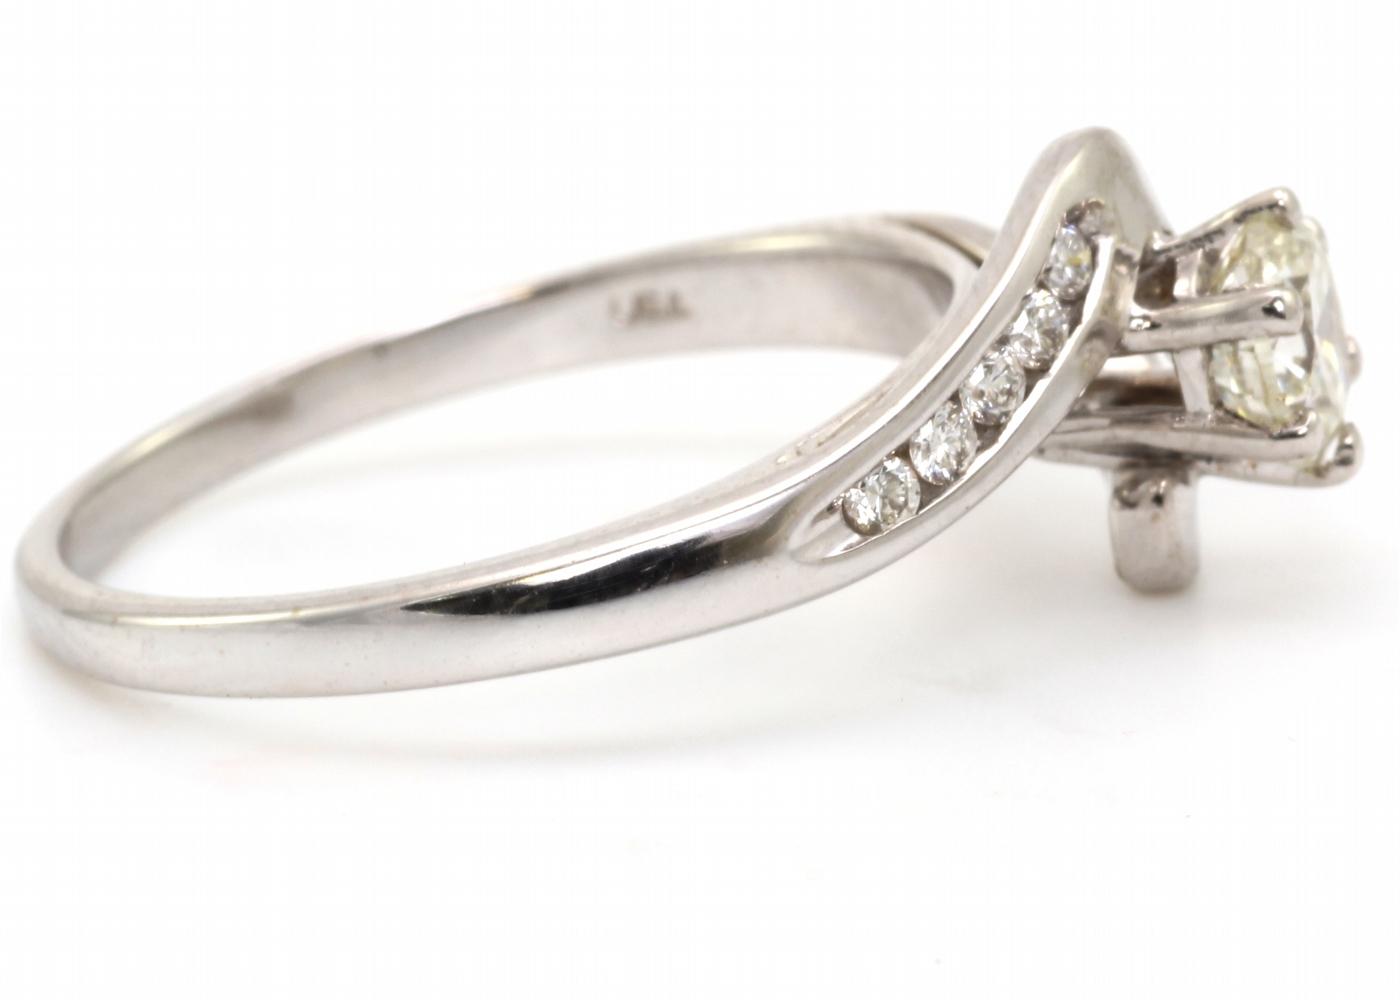 Lot 16 - 18ct White Gold Single Stone Diamond Ring 0.65 Carats